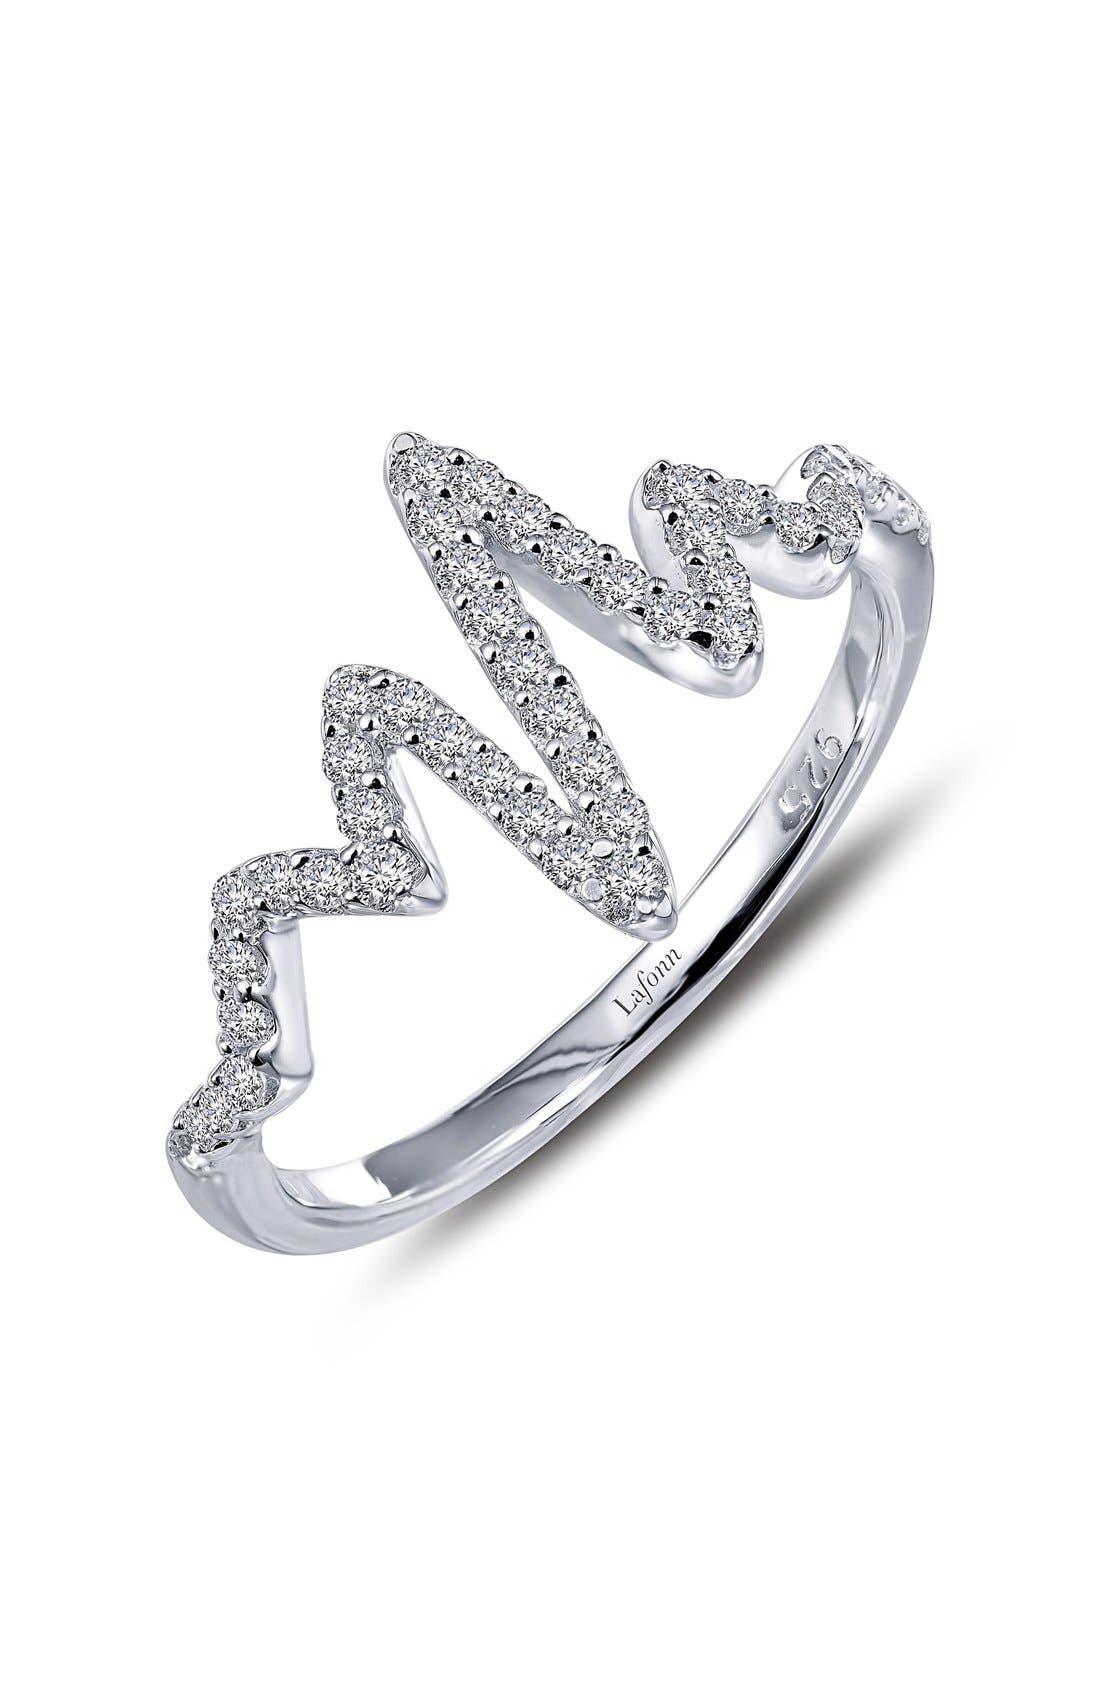 Main Image - Lafonn 'Lassaire' Pulse Ring